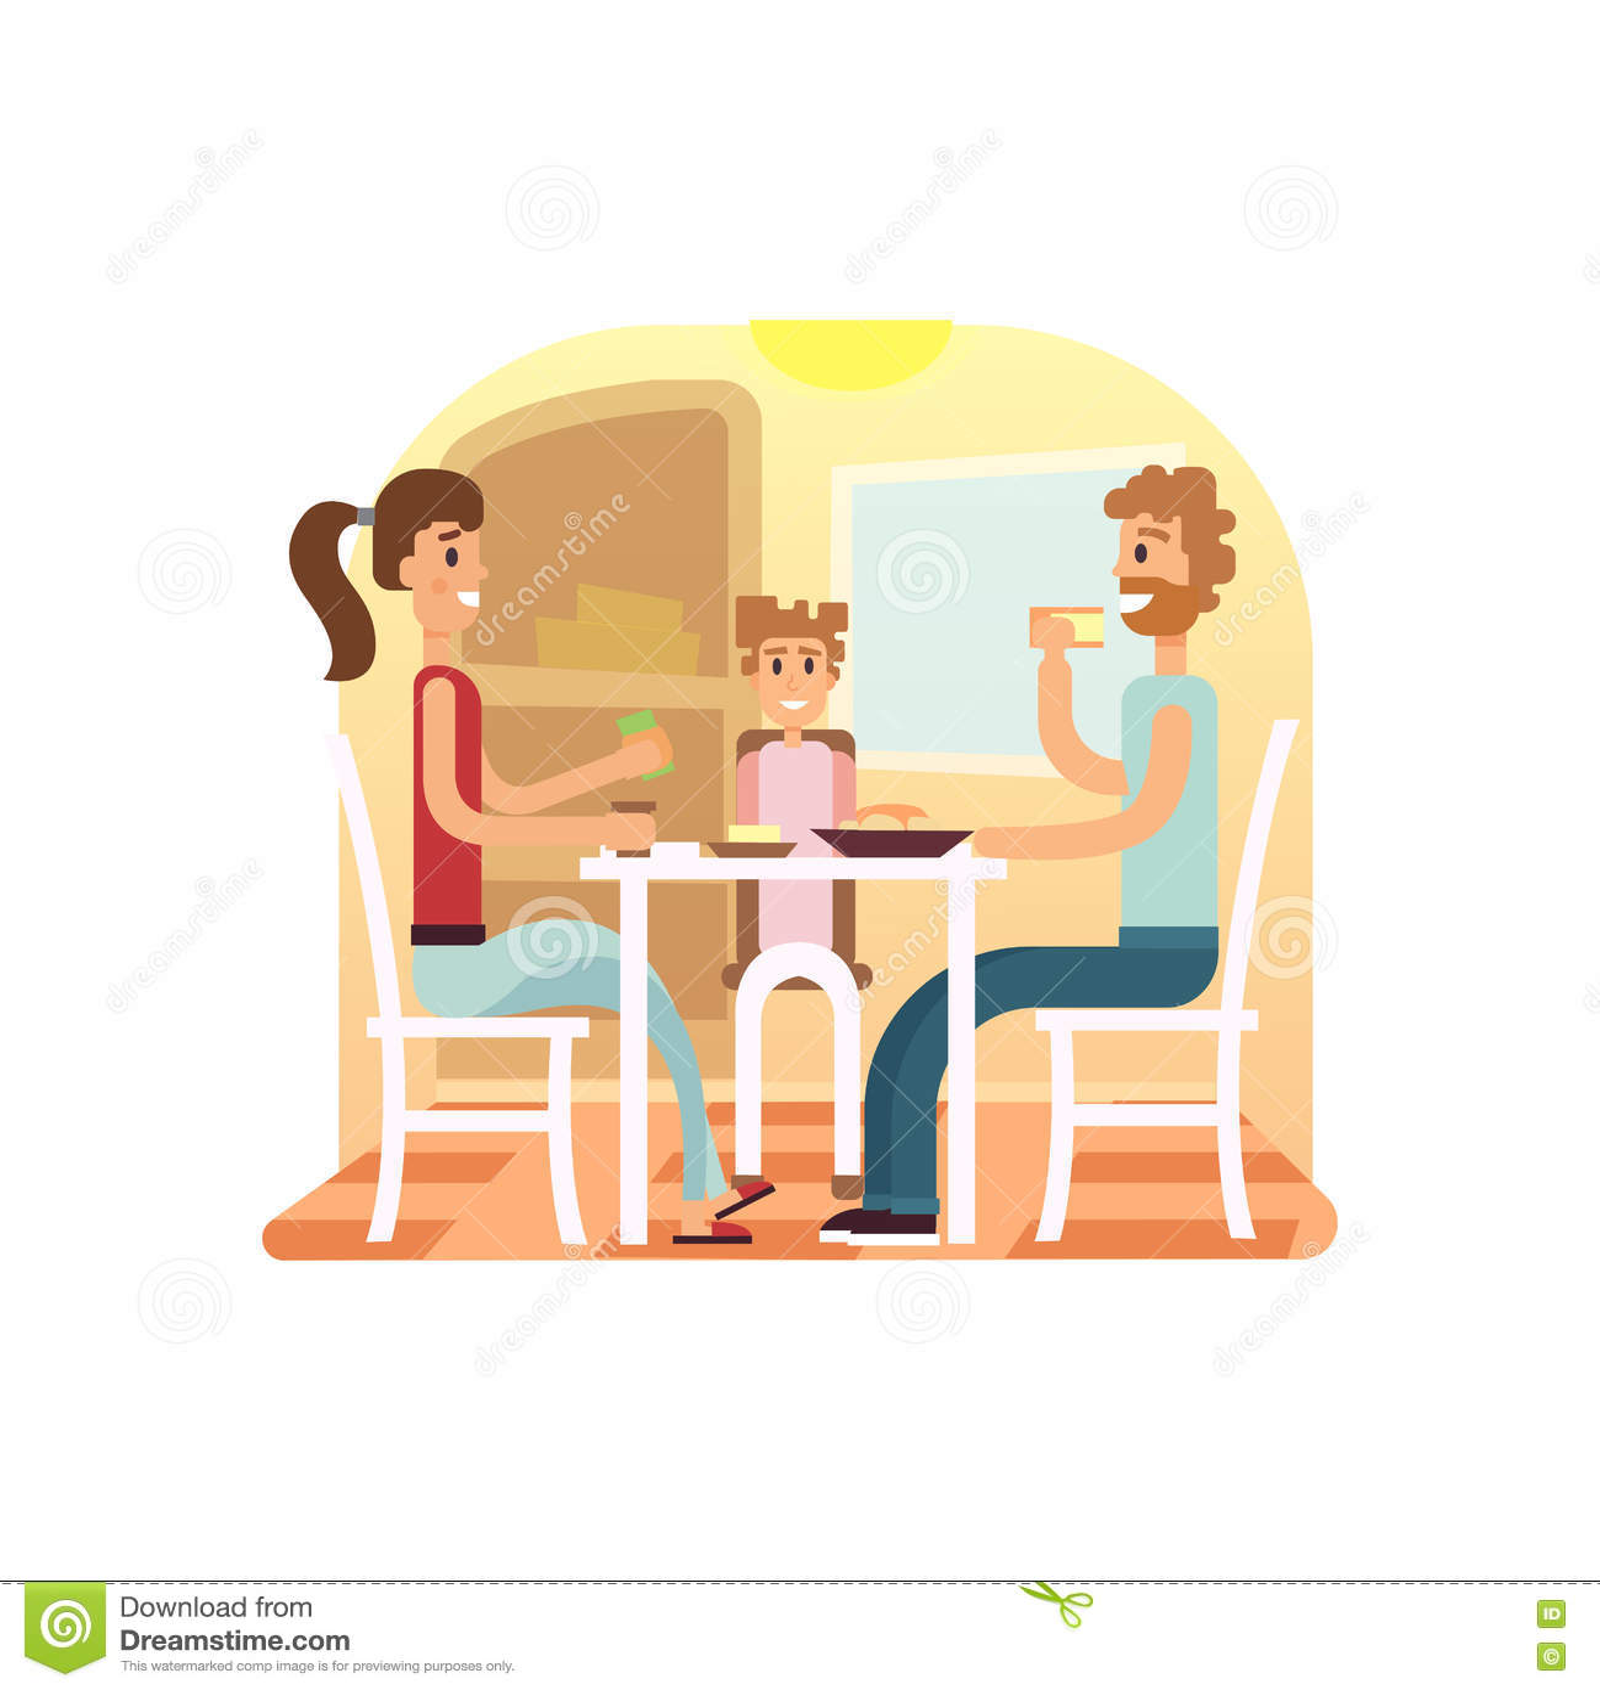 Family Holiday Cartoon Concepts Family Dinner Set Mom Dad Daughter At Dinner Vector Flat Illustration Illustration 78340872 Megapixl